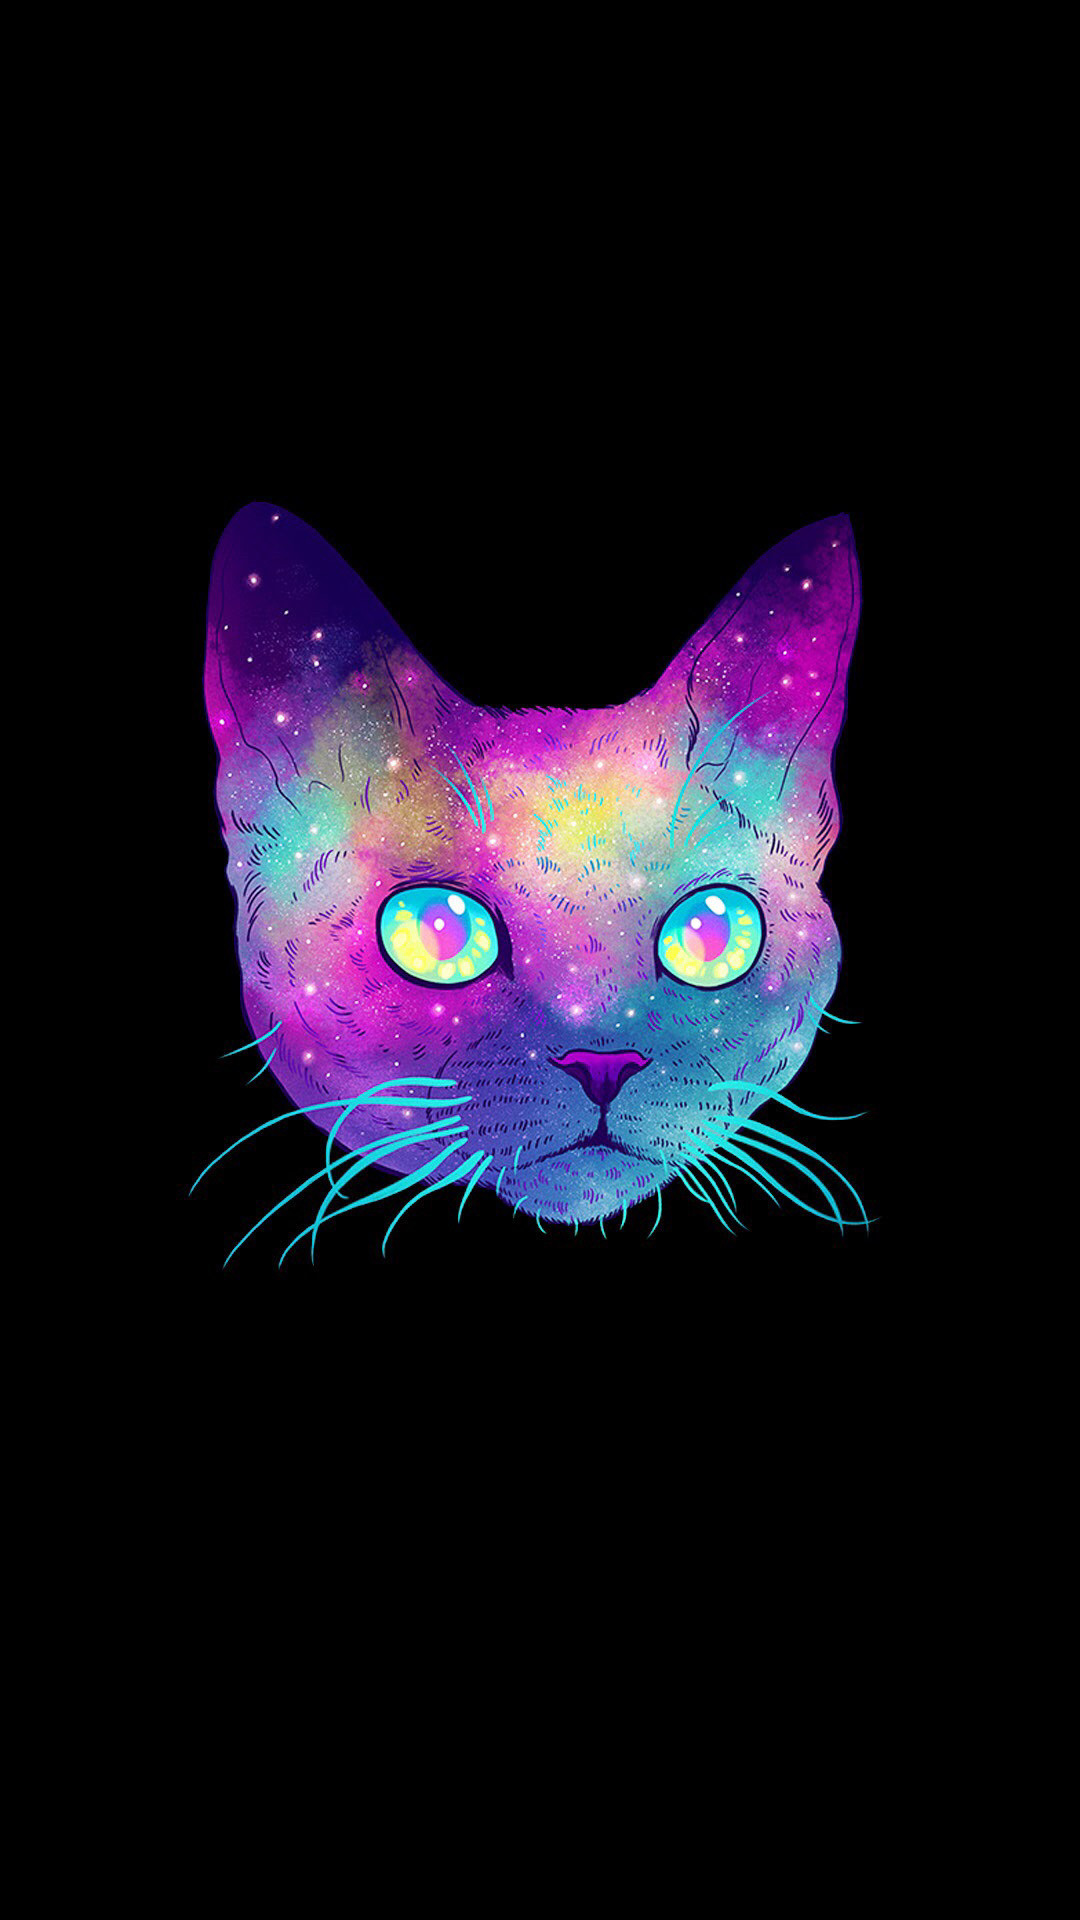 Artwork · Cat WallpaperWallpaper BackgroundsMinneapolisPhone Wallpapers GalaxiesIllustrationsGalaxy …